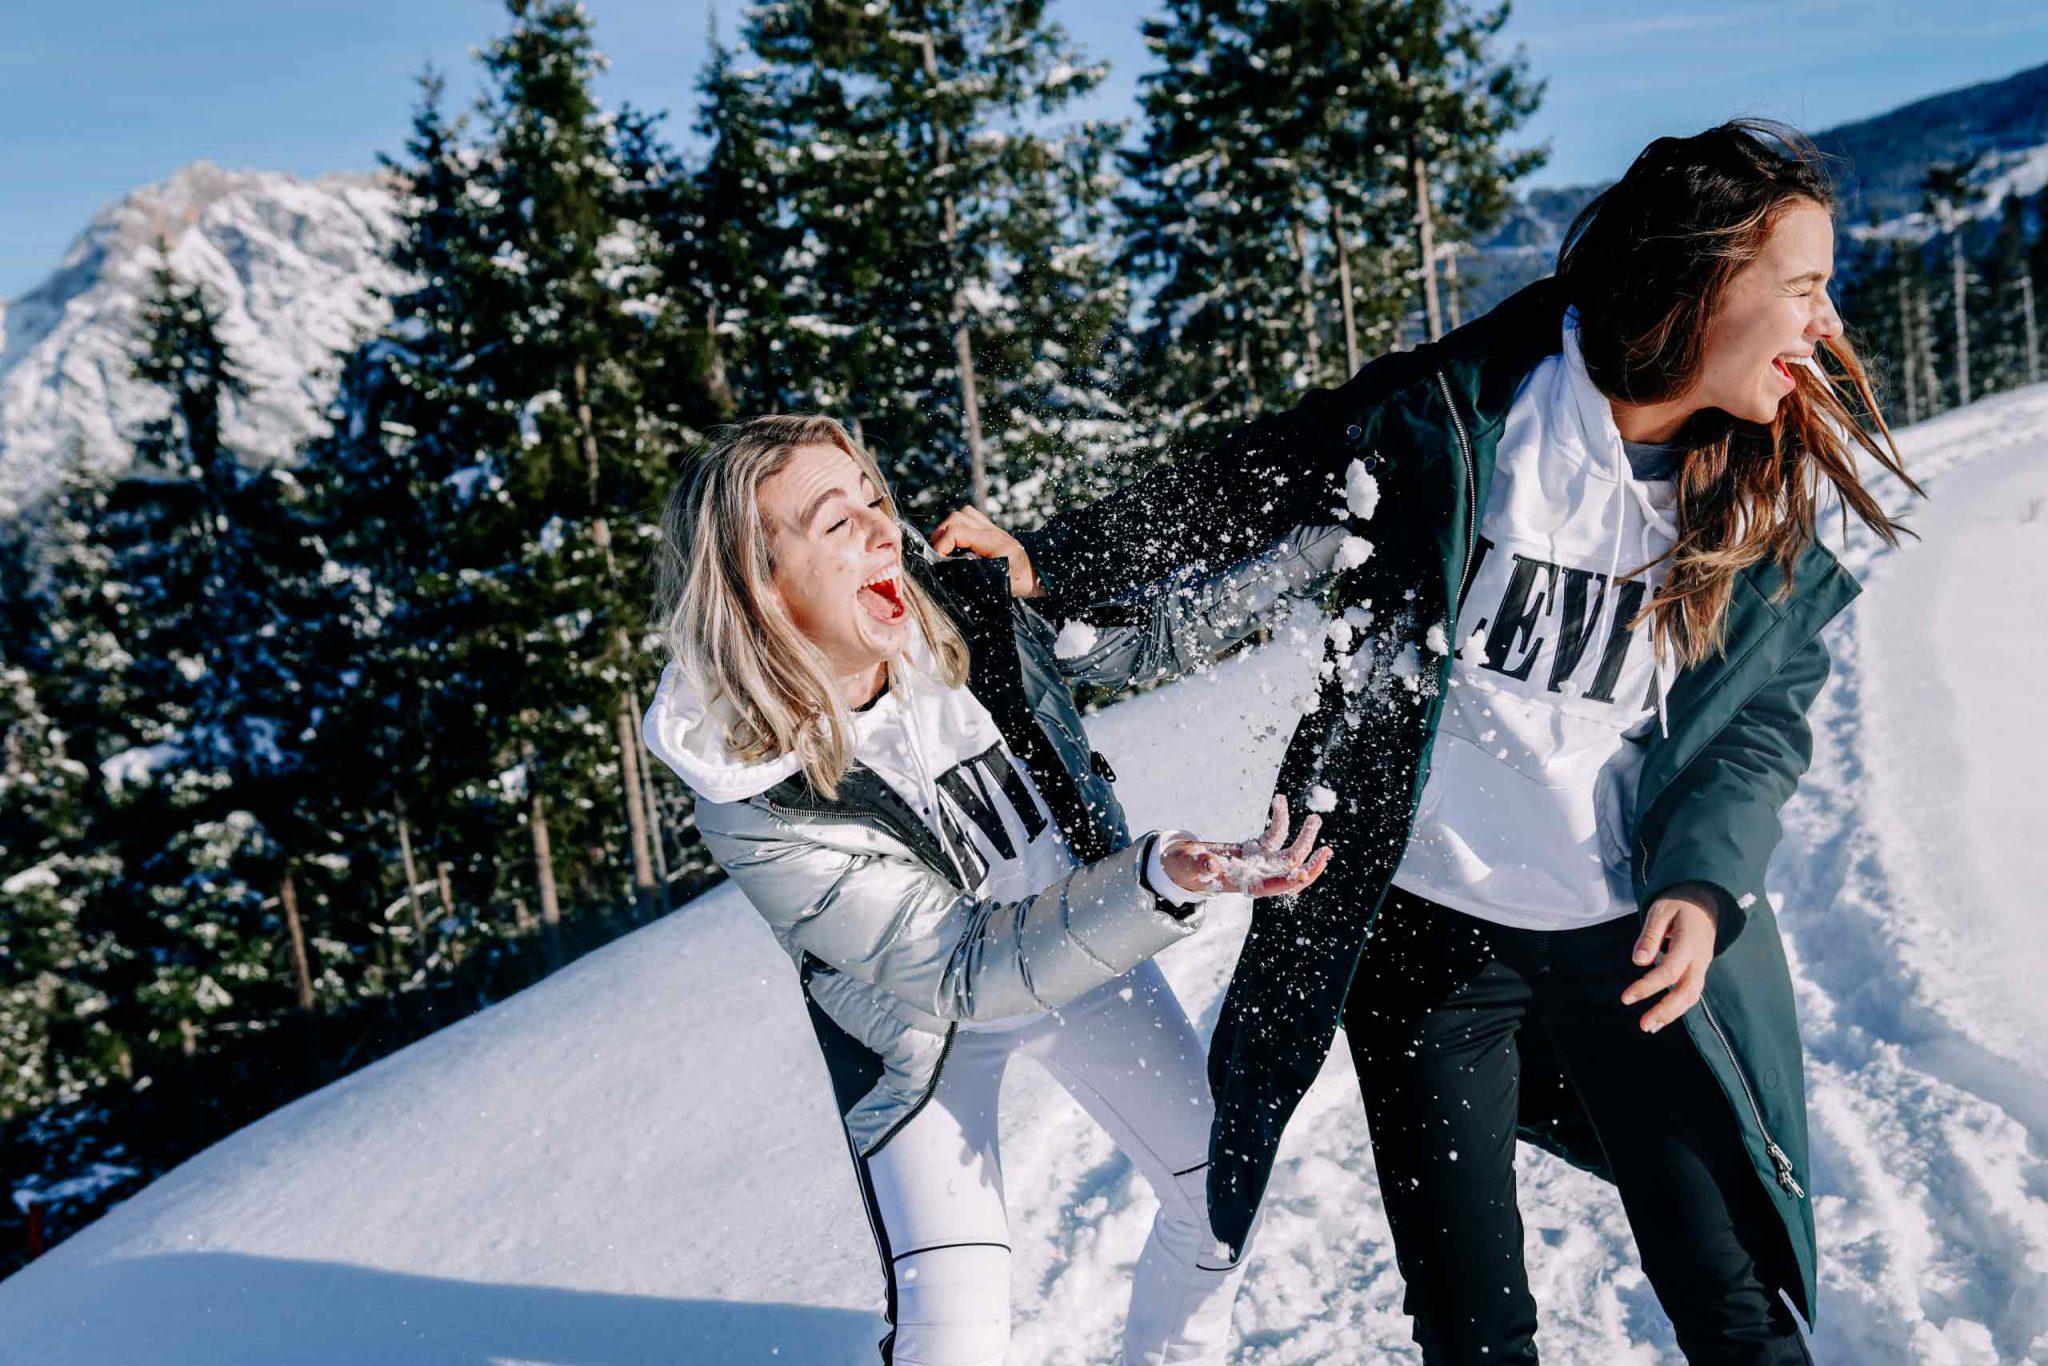 Levis_Austria_Ski_Trip_Ilsoo_van_Dijk_ISVD_10122019-03264